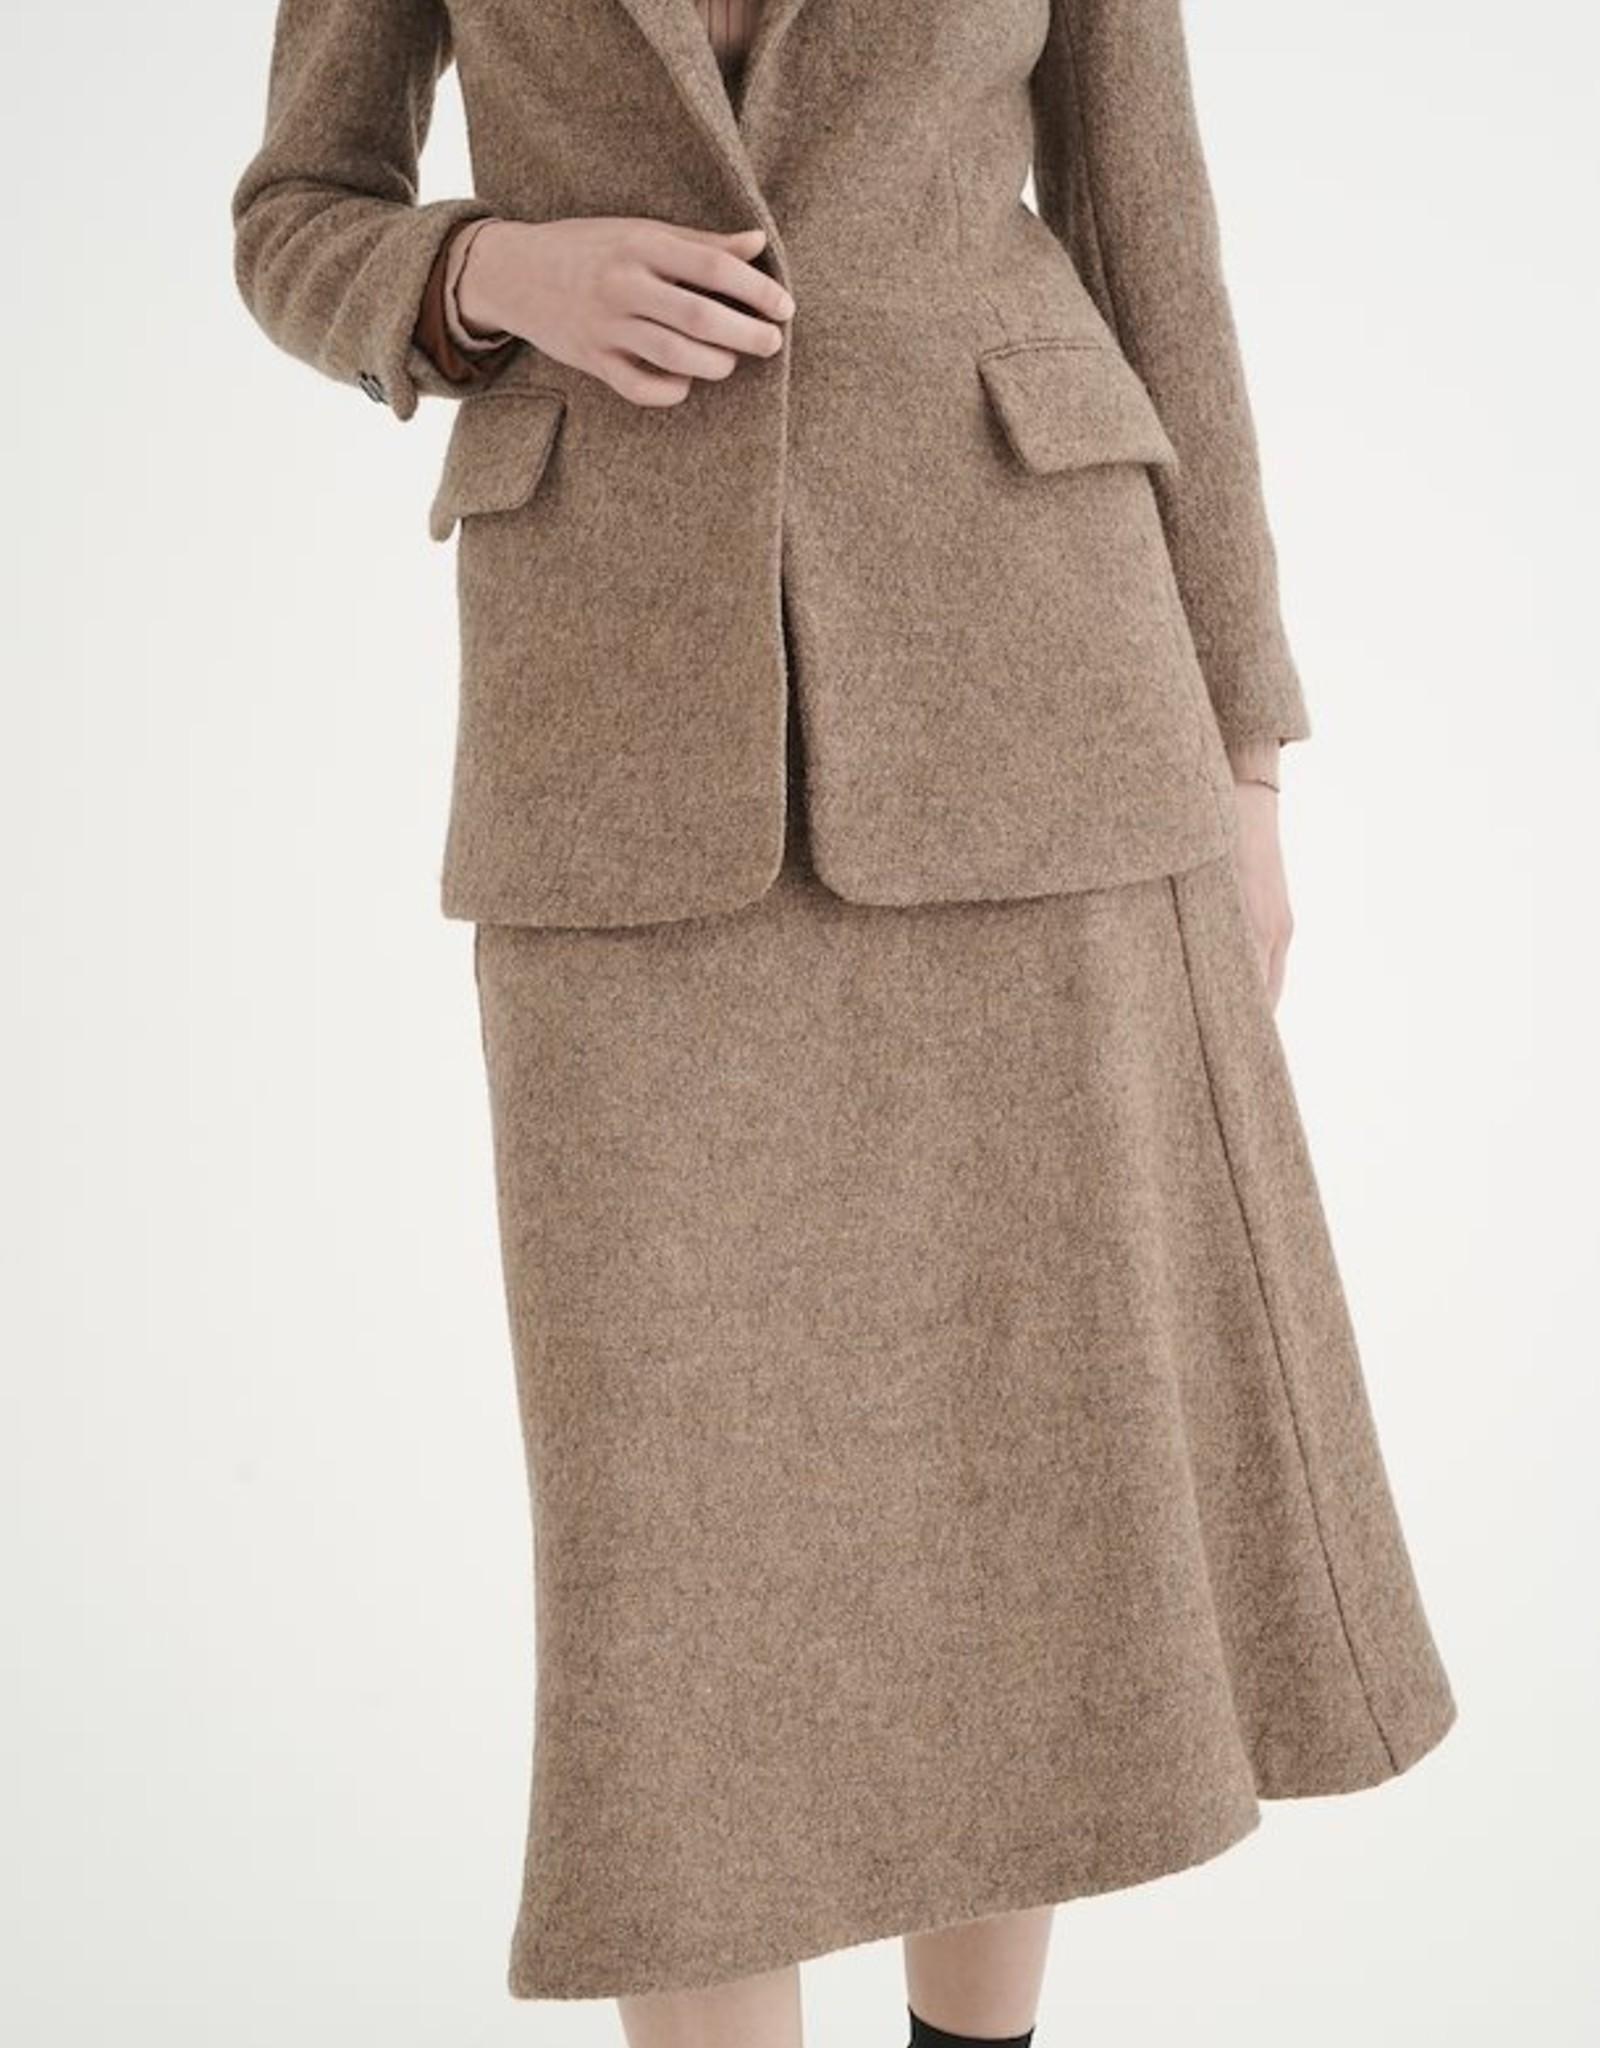 InWear Channing A-Line Skirt Brown Melange